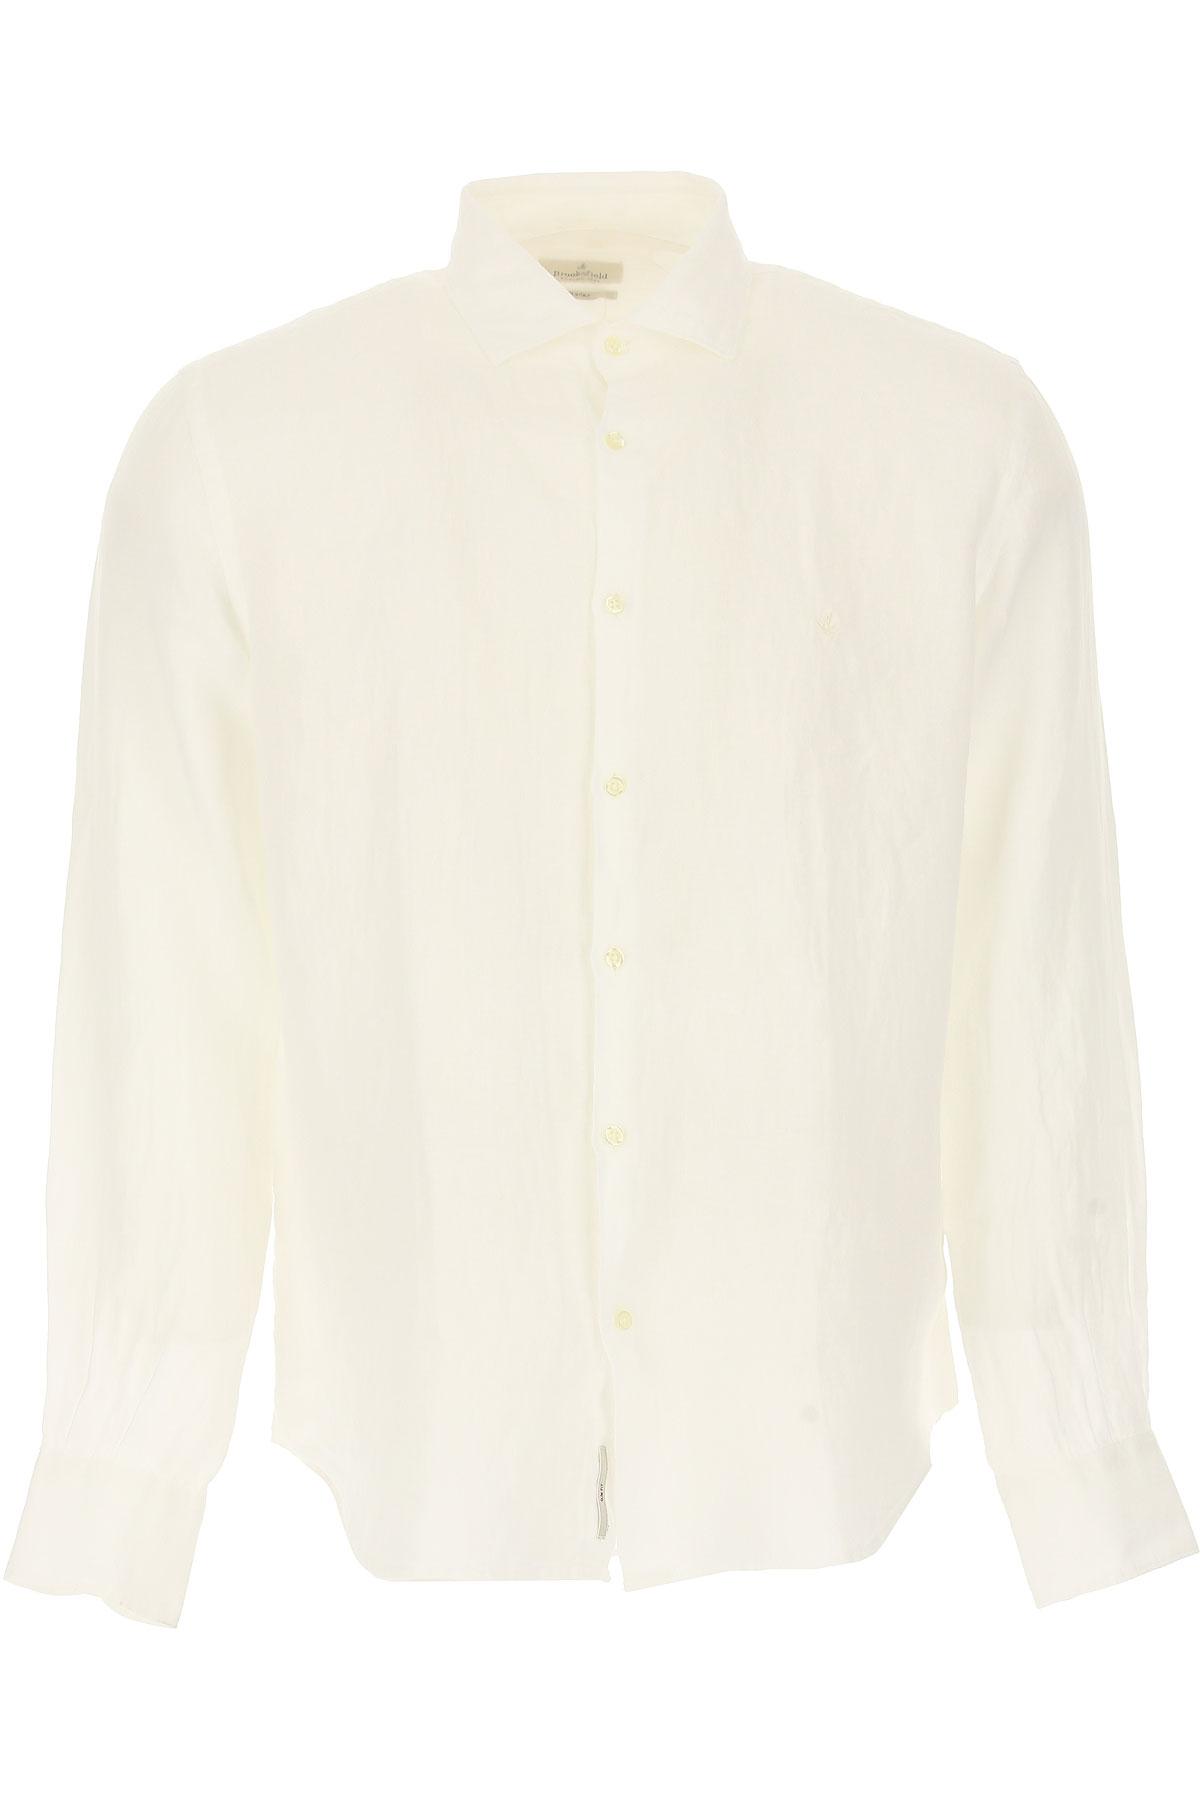 Brooksfield Shirt For Men On Sale, Light Ivory, Linen, 2019, 15.5 15.75 16 17 17.5